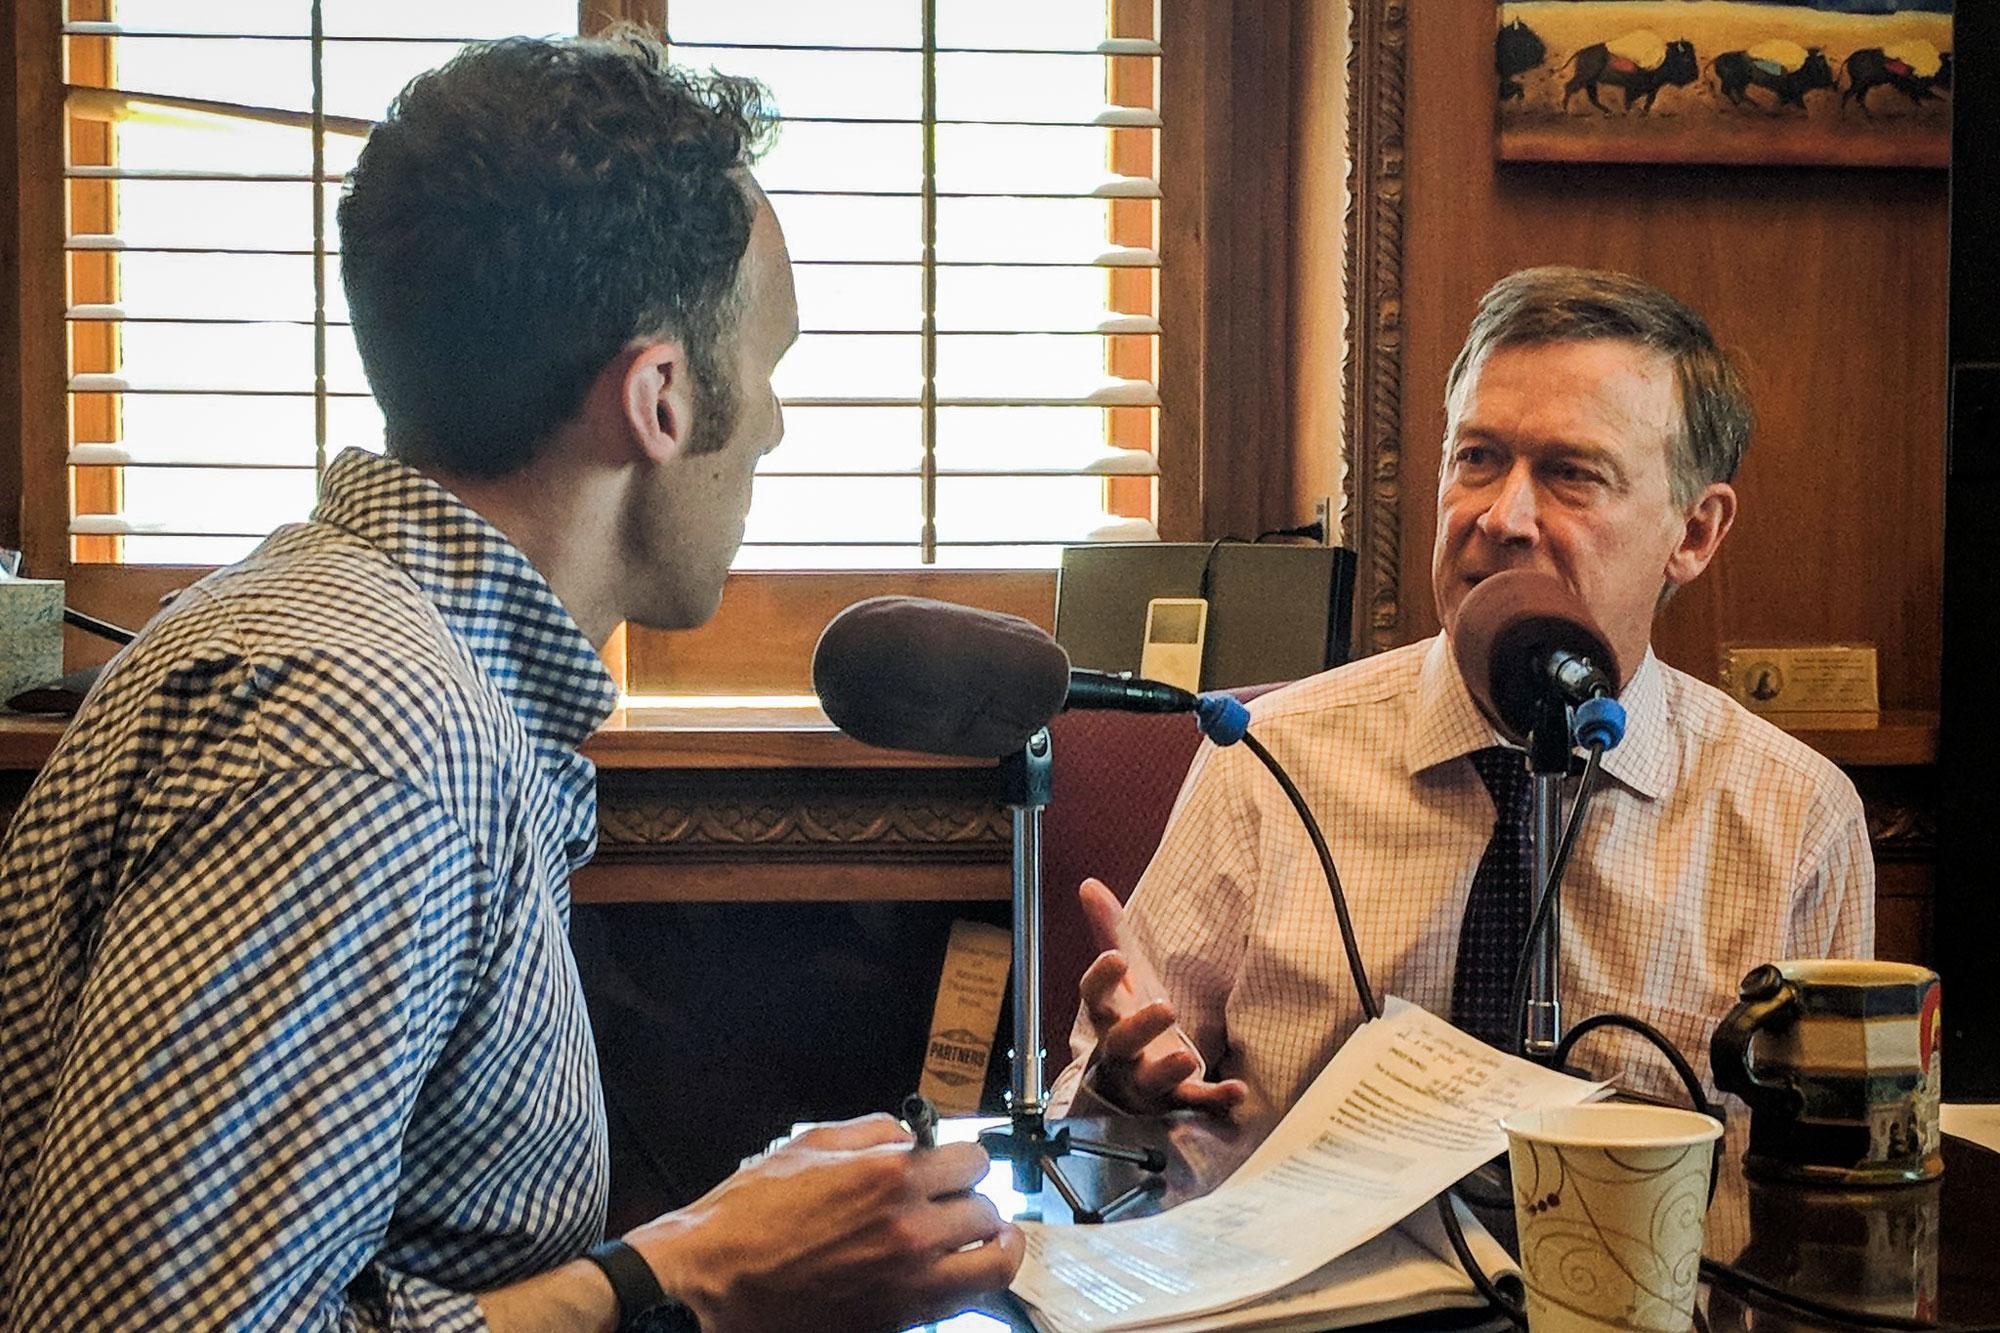 <p>Colorado Matters host Ryan Warner, left, interviews Gov. John Hickenlooper in his office at the Capitol, May 16, 2018.</p>